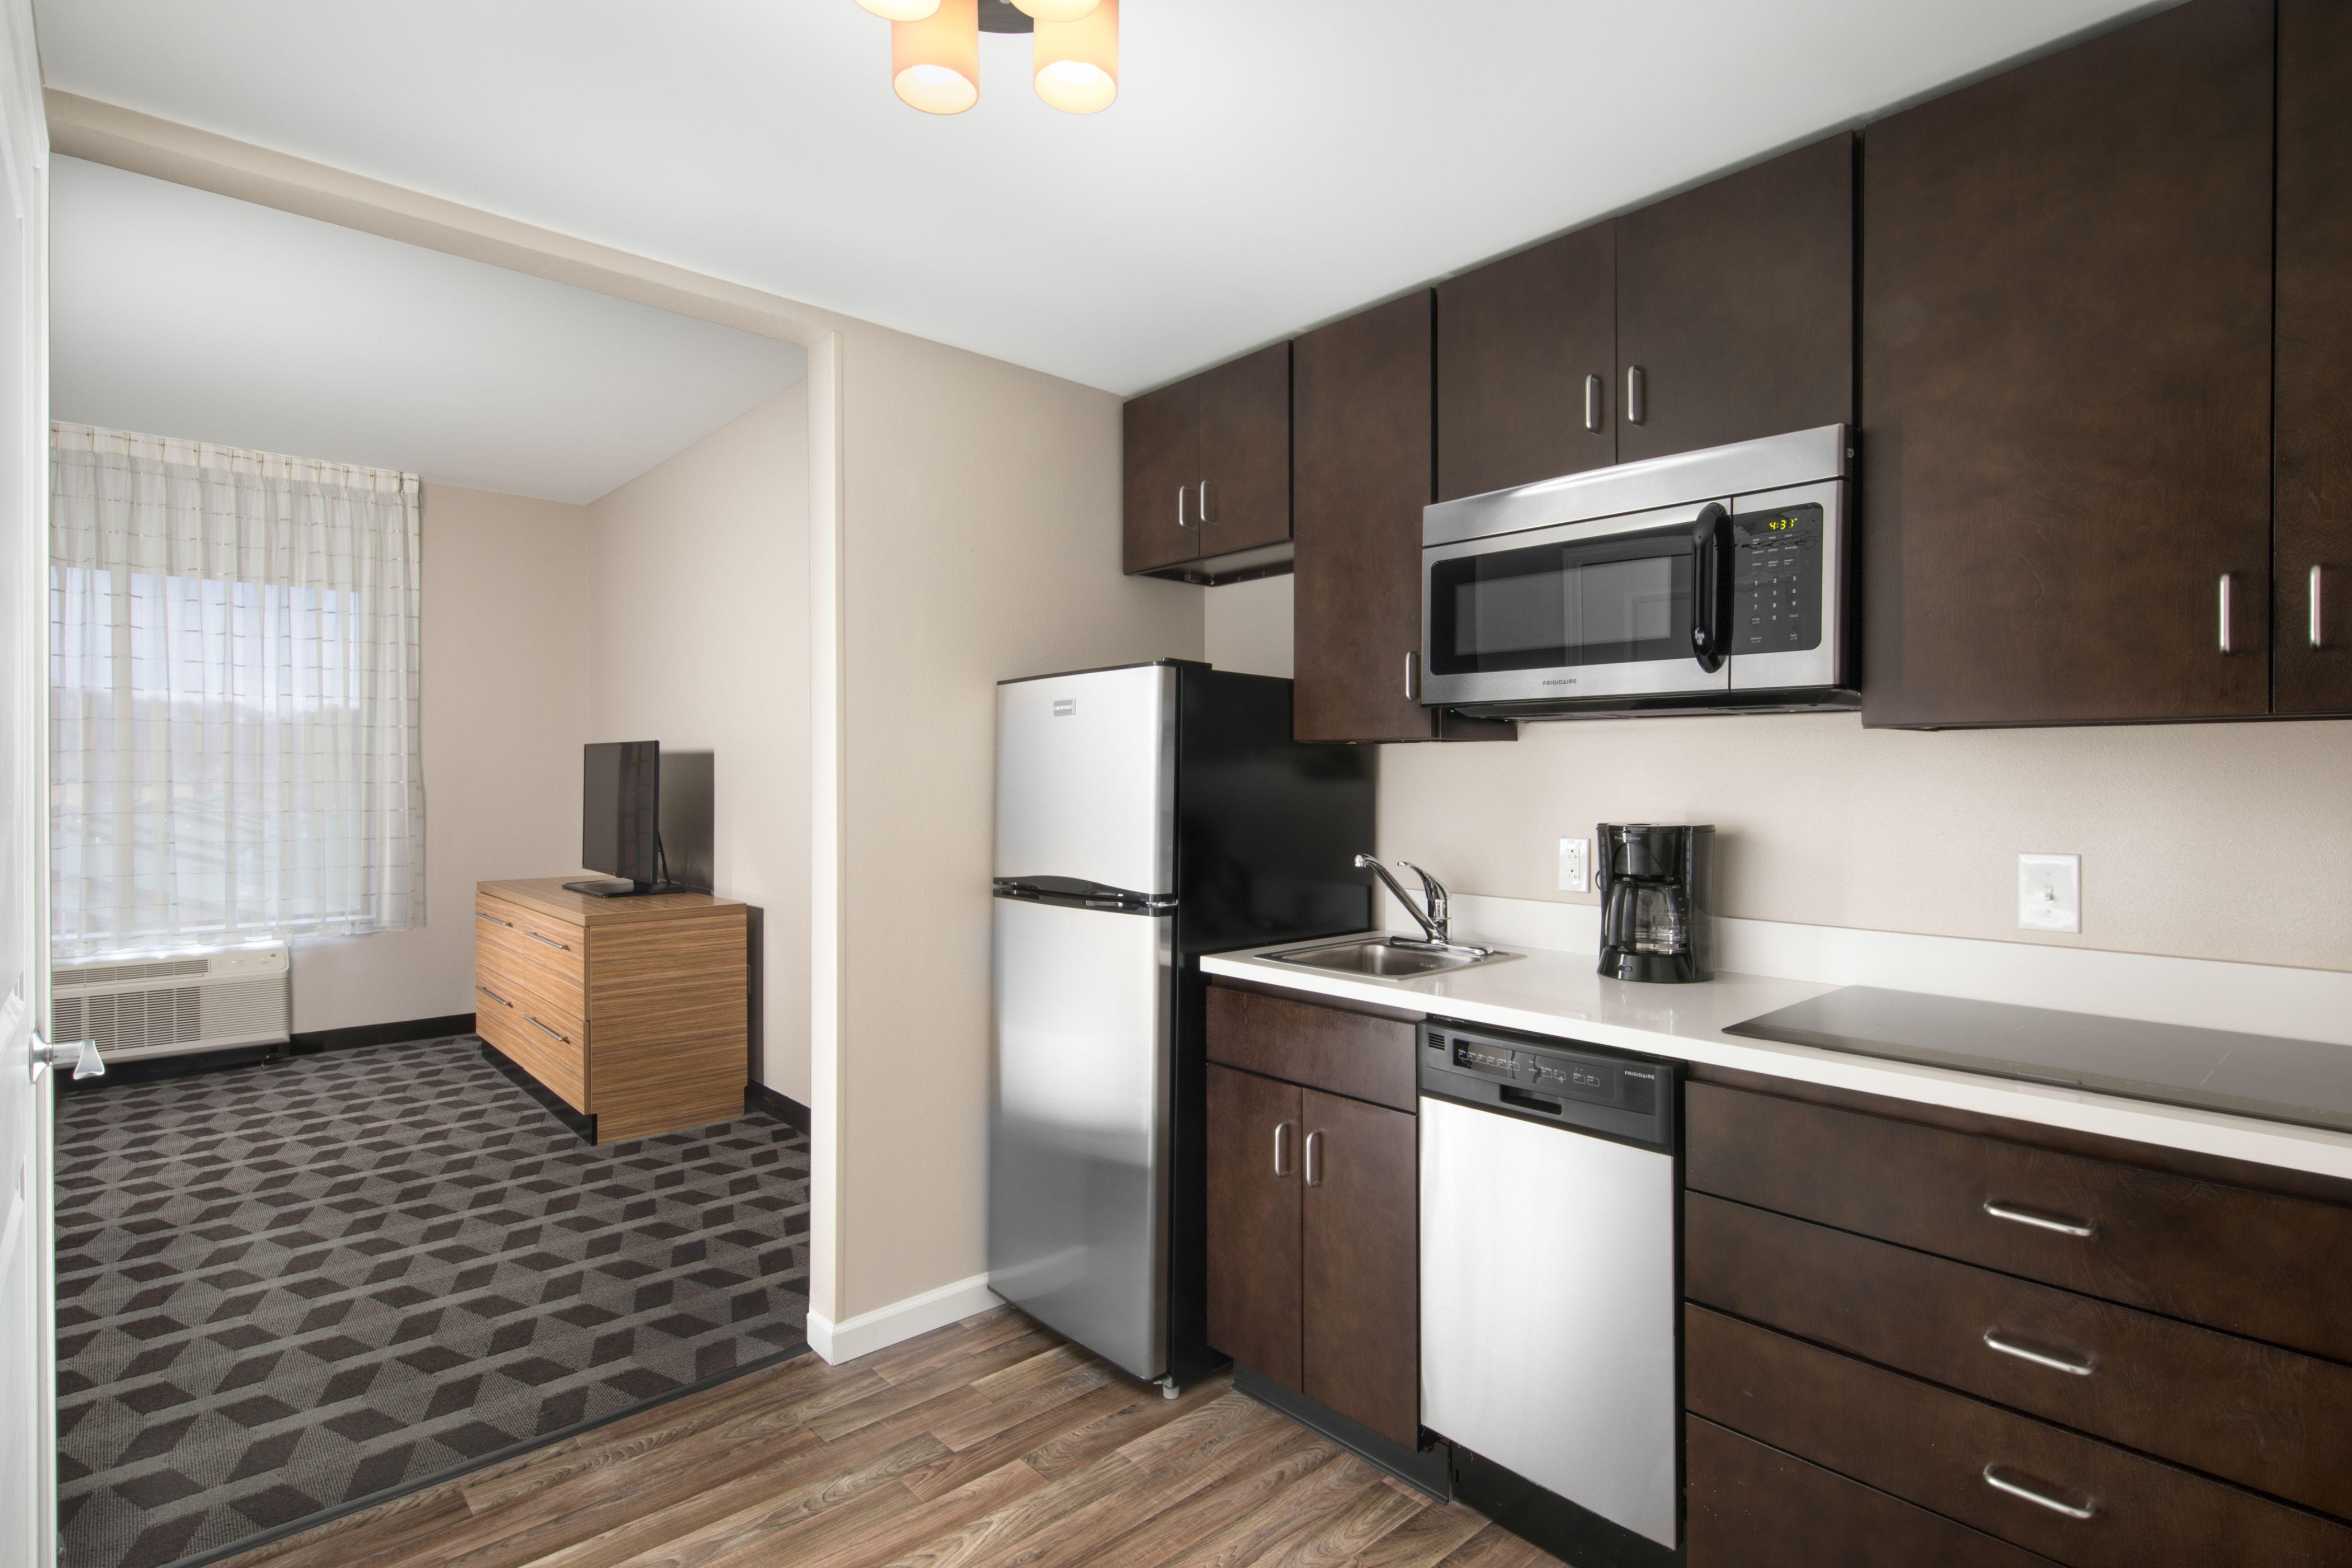 TownePlace Suites by Marriott Nashville Smyrna image 4